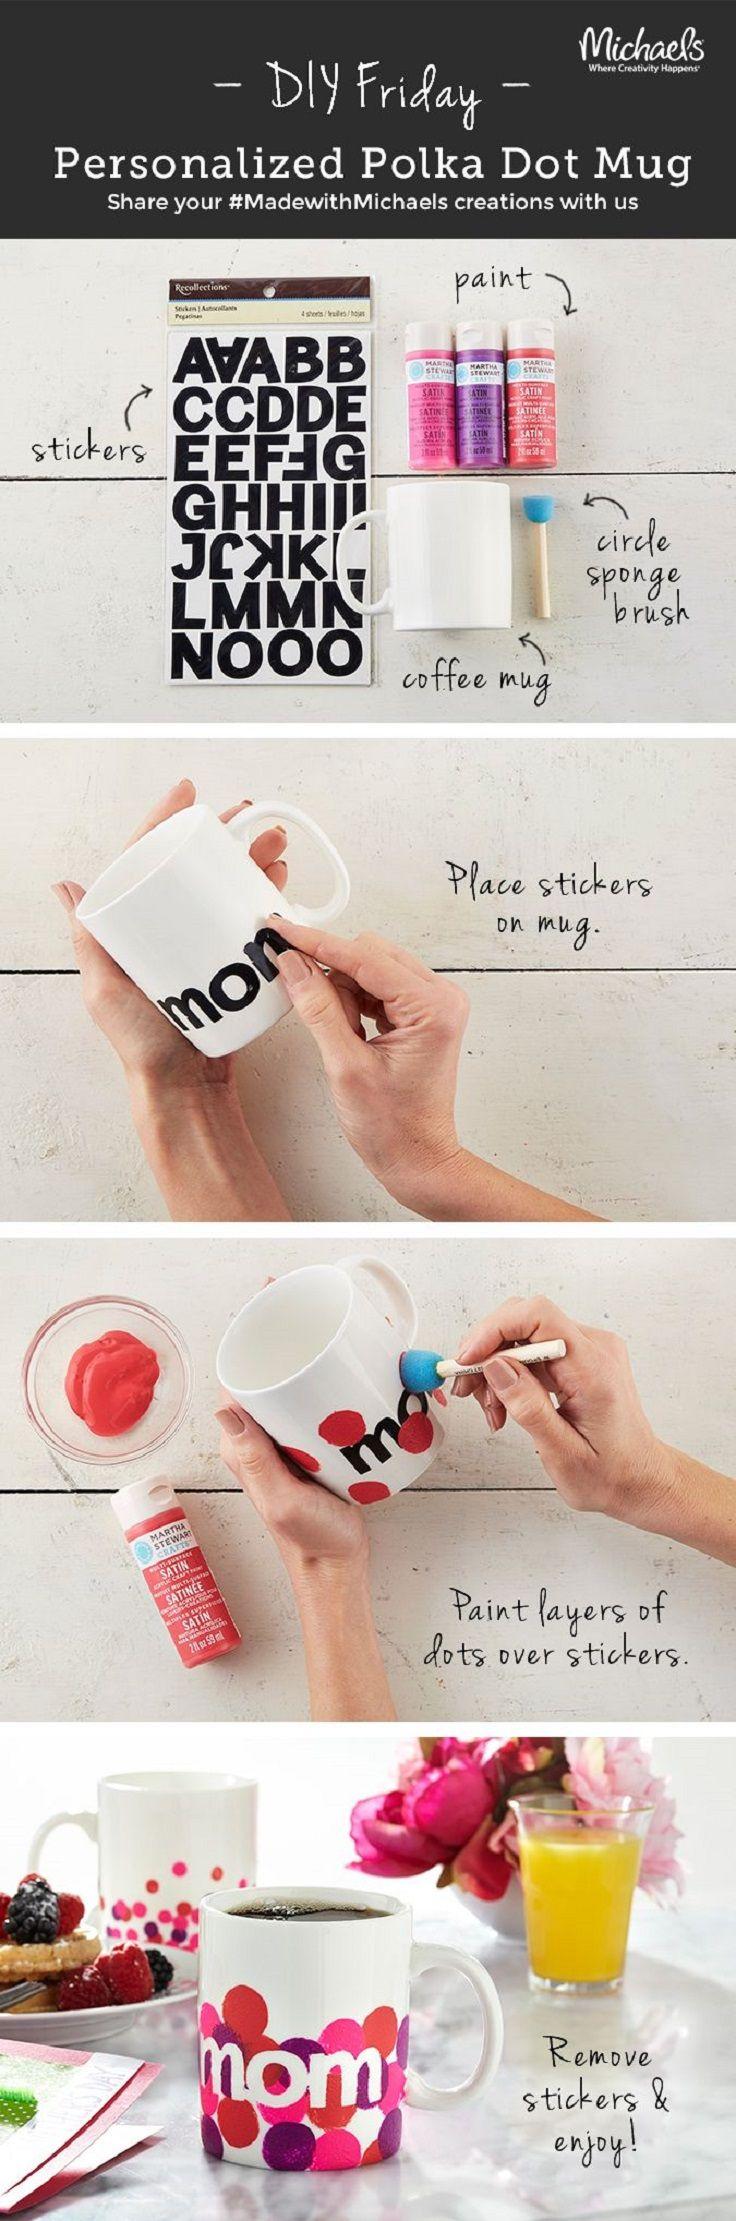 DIY Personalized Polka Dot Mug - 14 Pinspired DIY Birthday Gift Tutorials